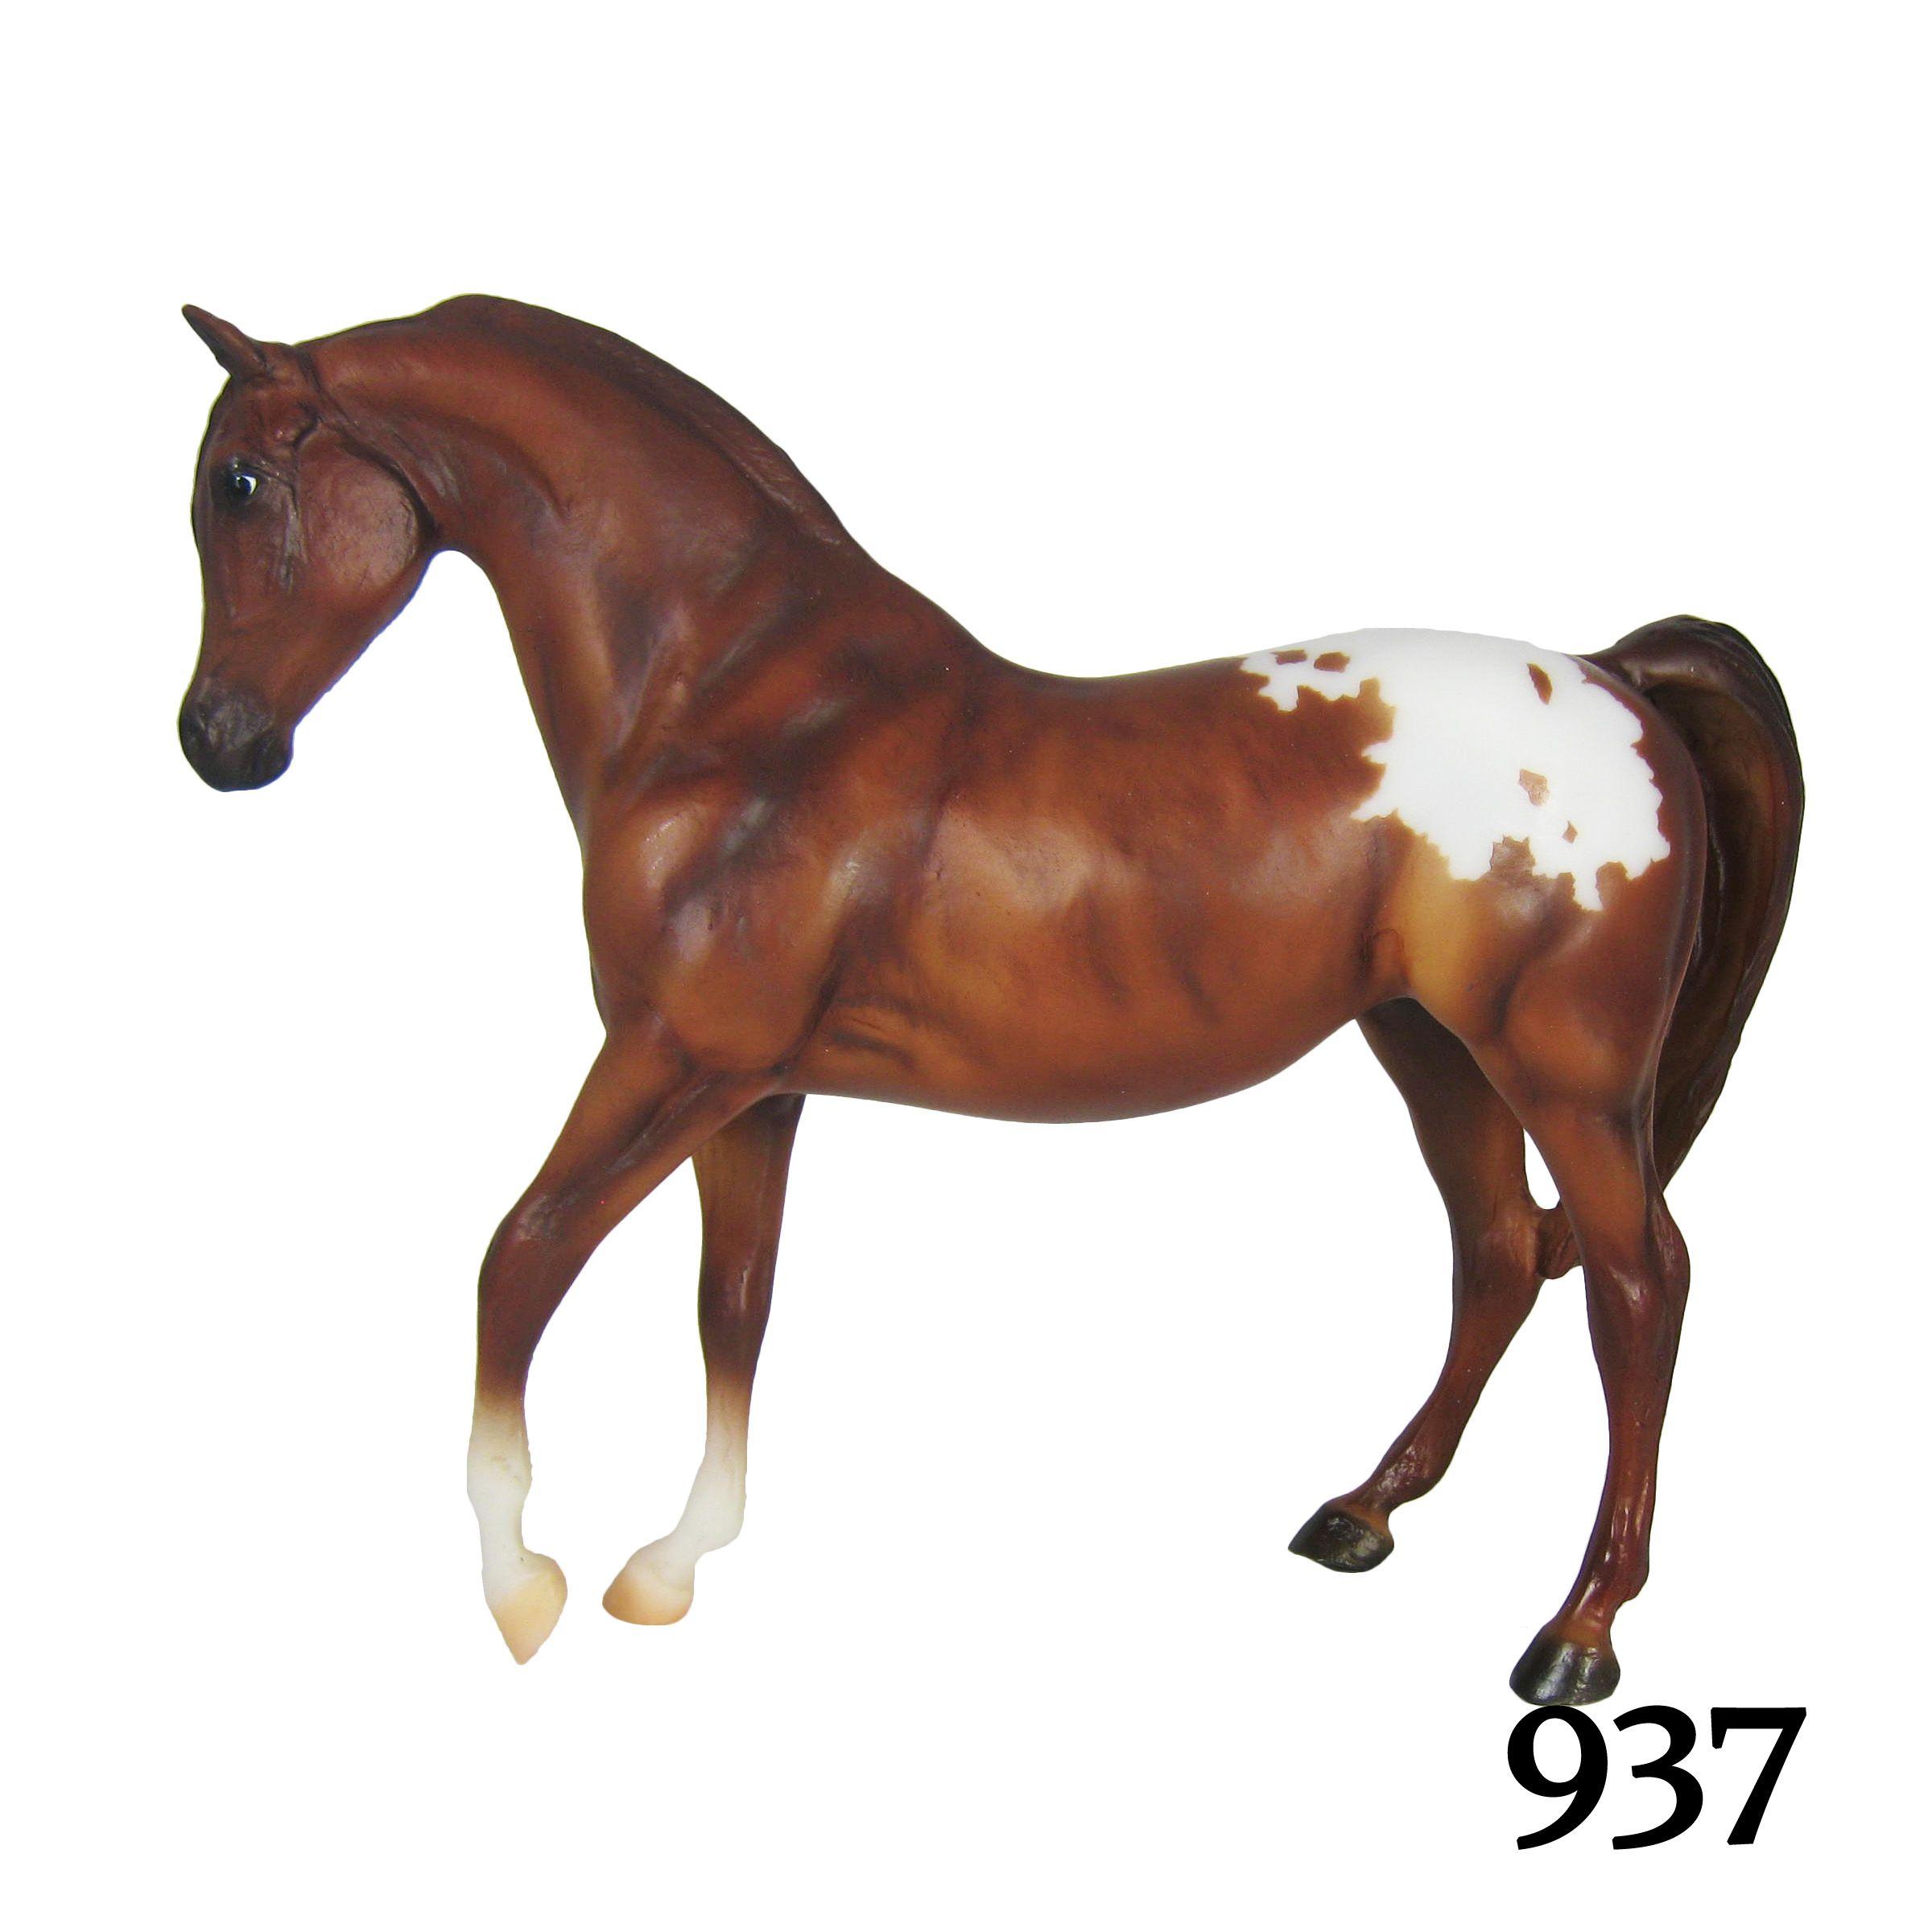 breyer horeses | Breyer Horse Toys | Memories | Pinterest ... - photo#49